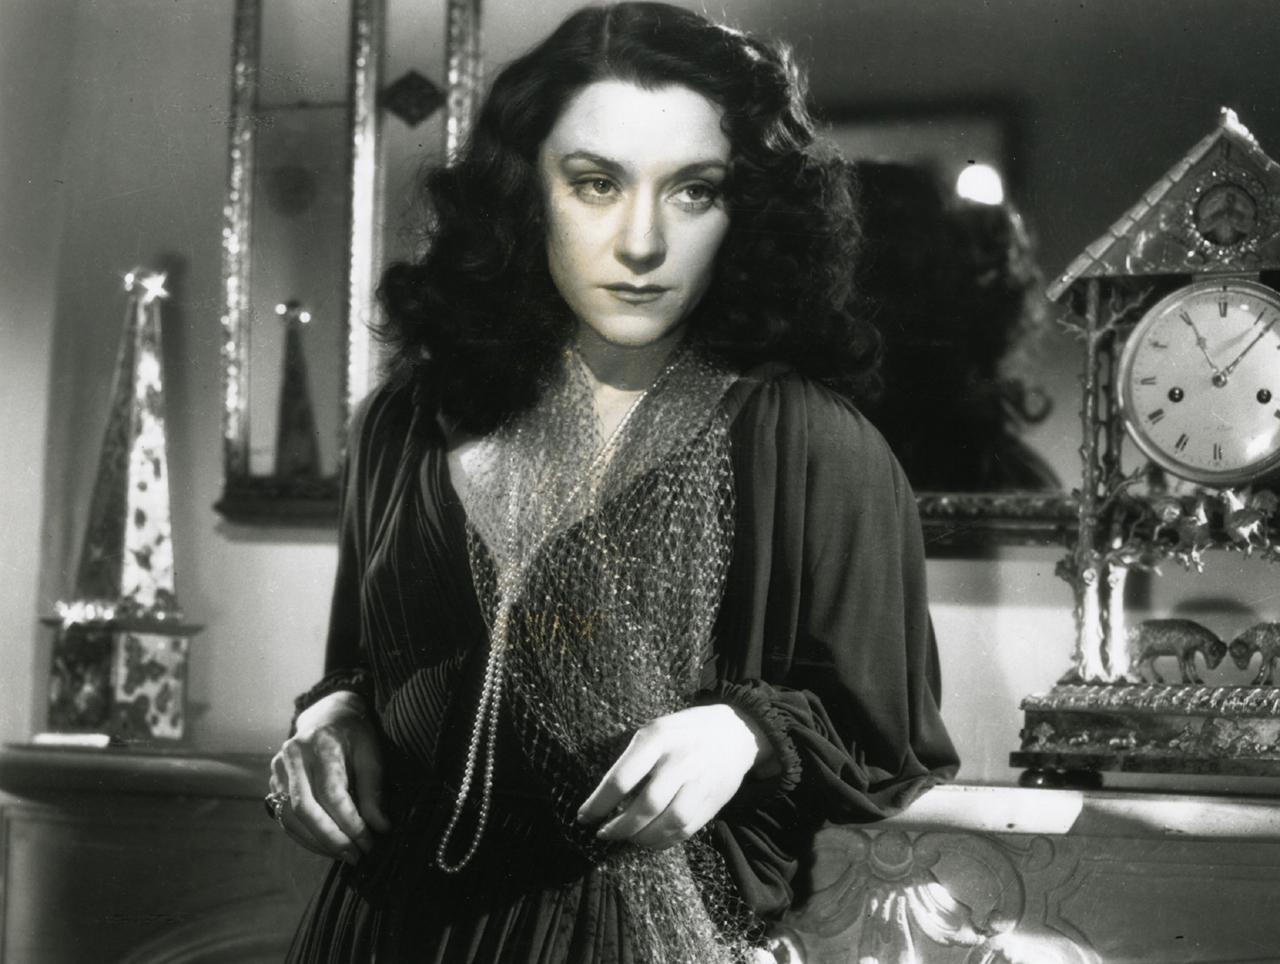 Robert Bresson, 'Les dames du Bois de Boulogne' (1945), film still (image courtesy Janus Films)